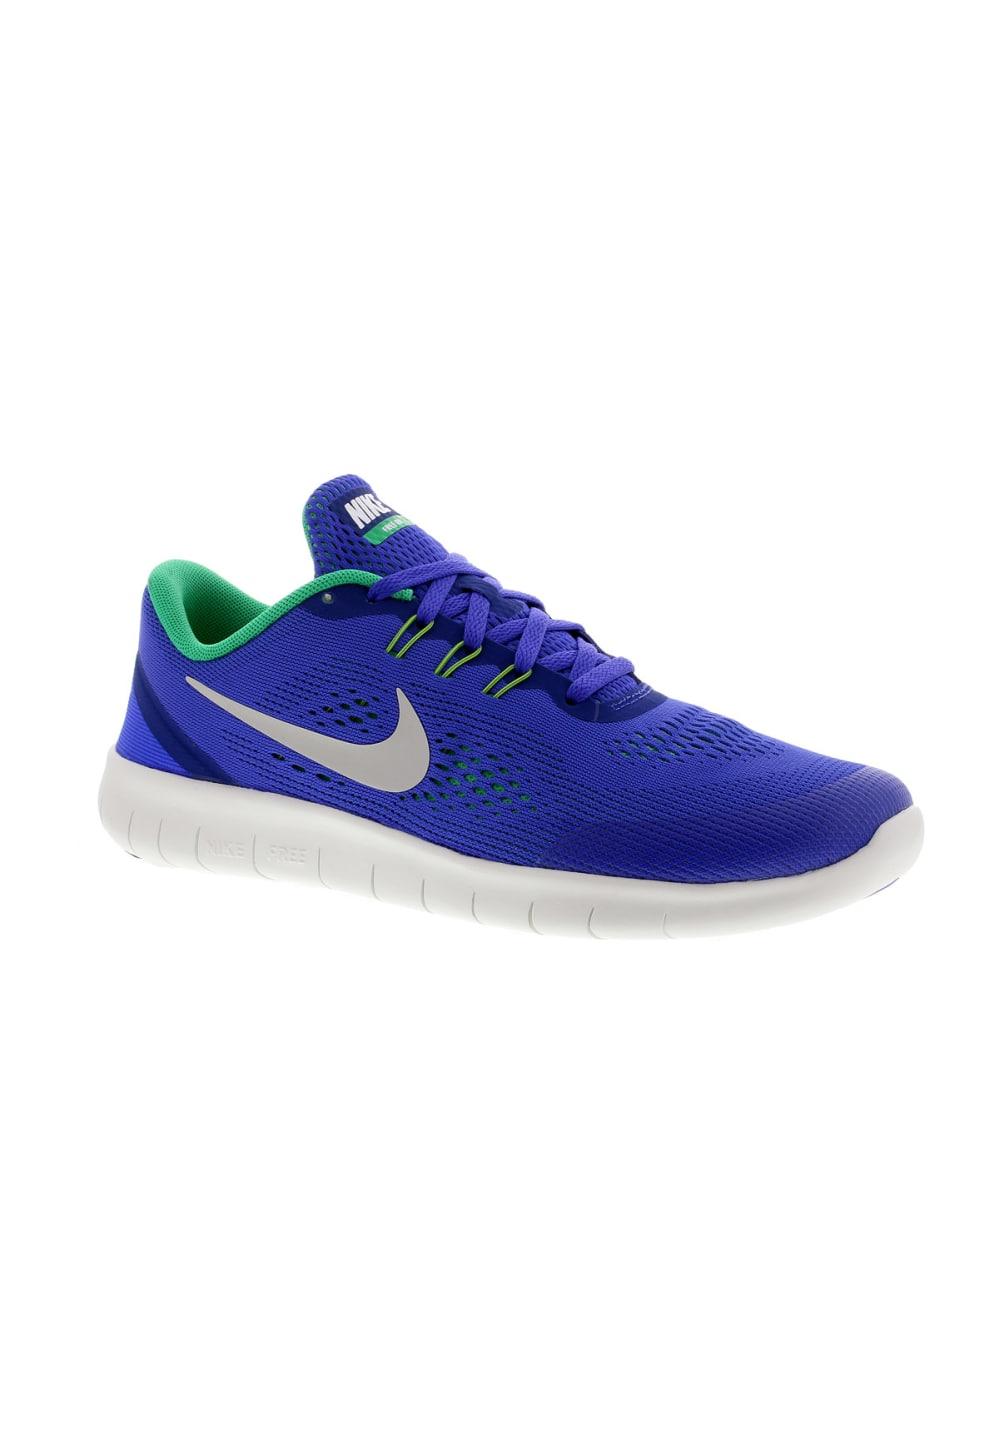 online store 4b1ec 5d7e8 Nike Free RN GS Boys - Running shoes - Purple